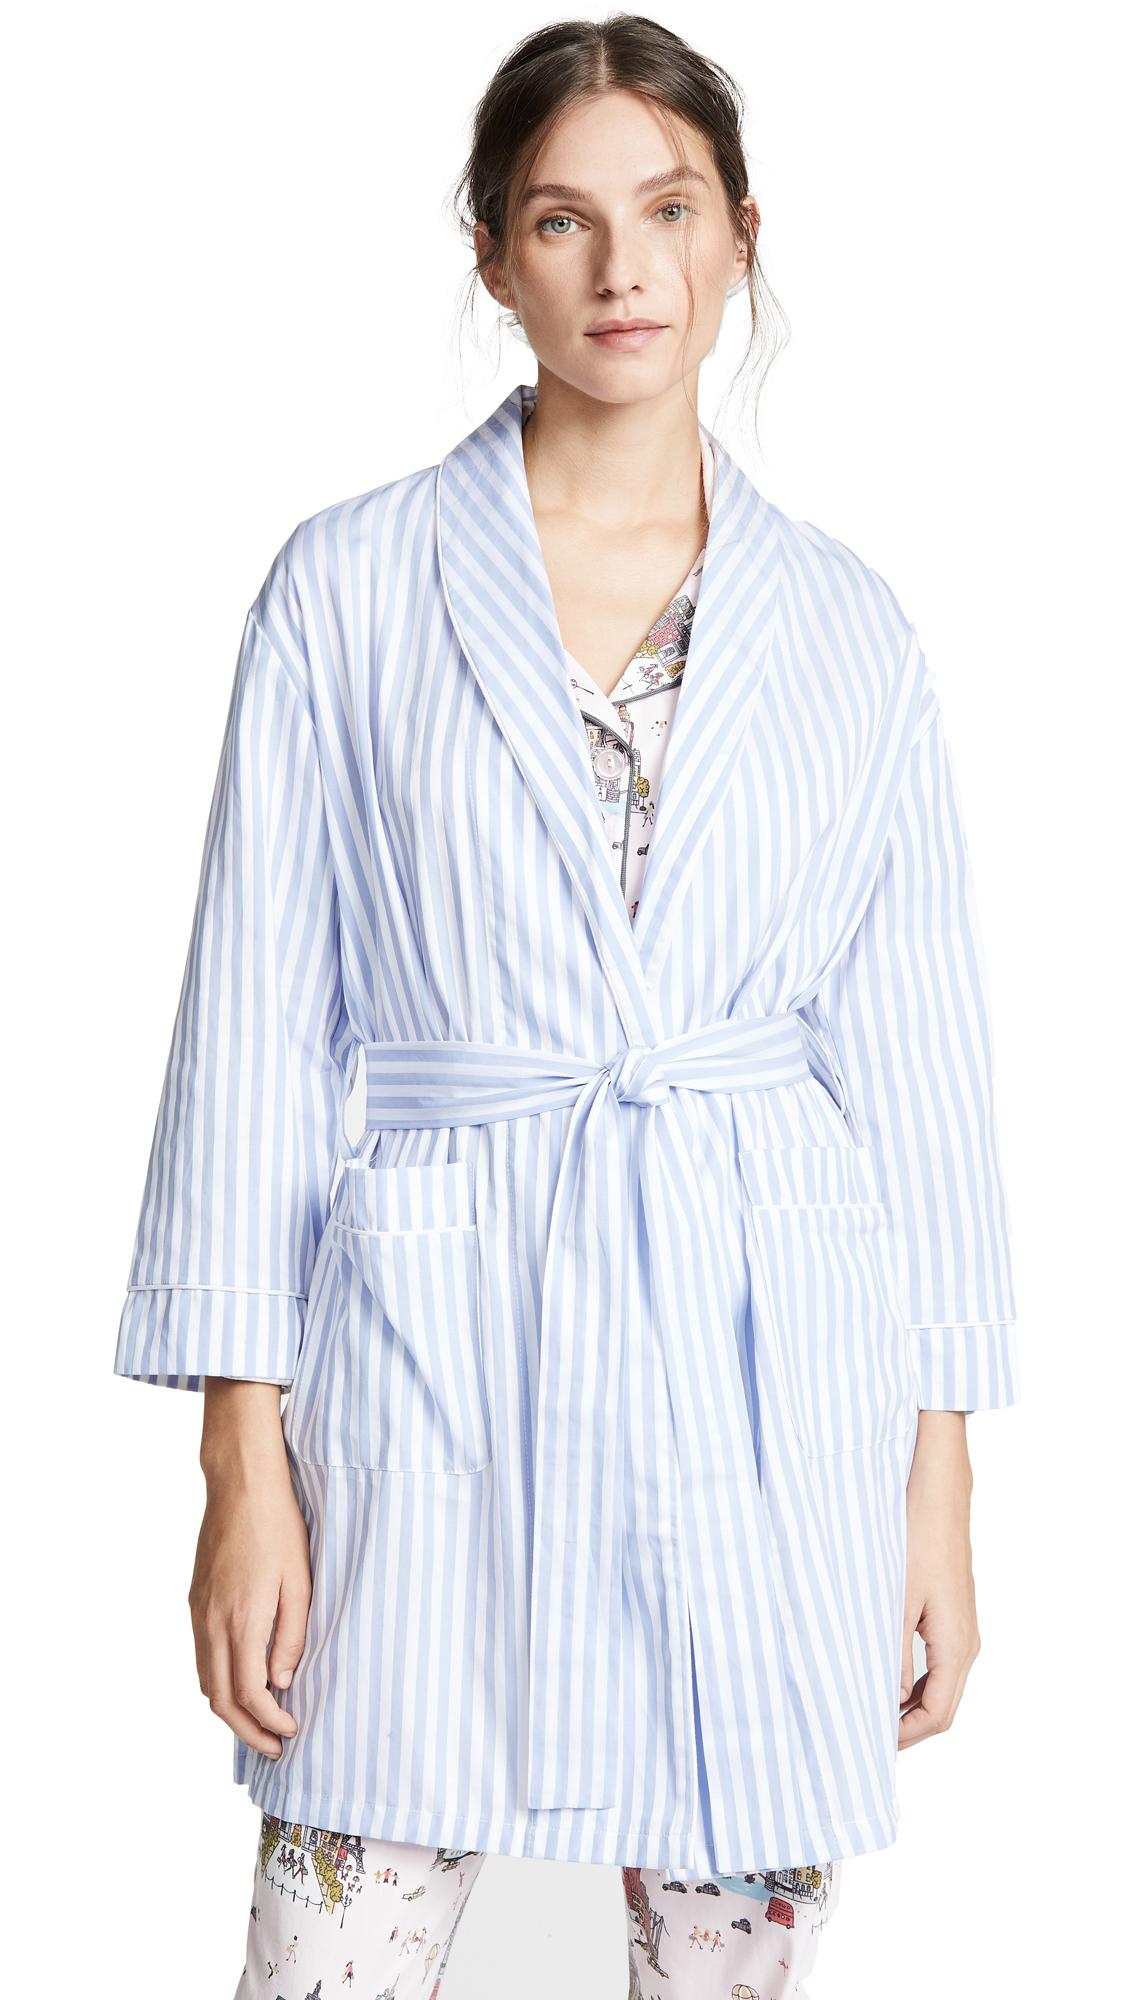 BedHead Pajamas Blue Stripe Robe - Blue Stripe